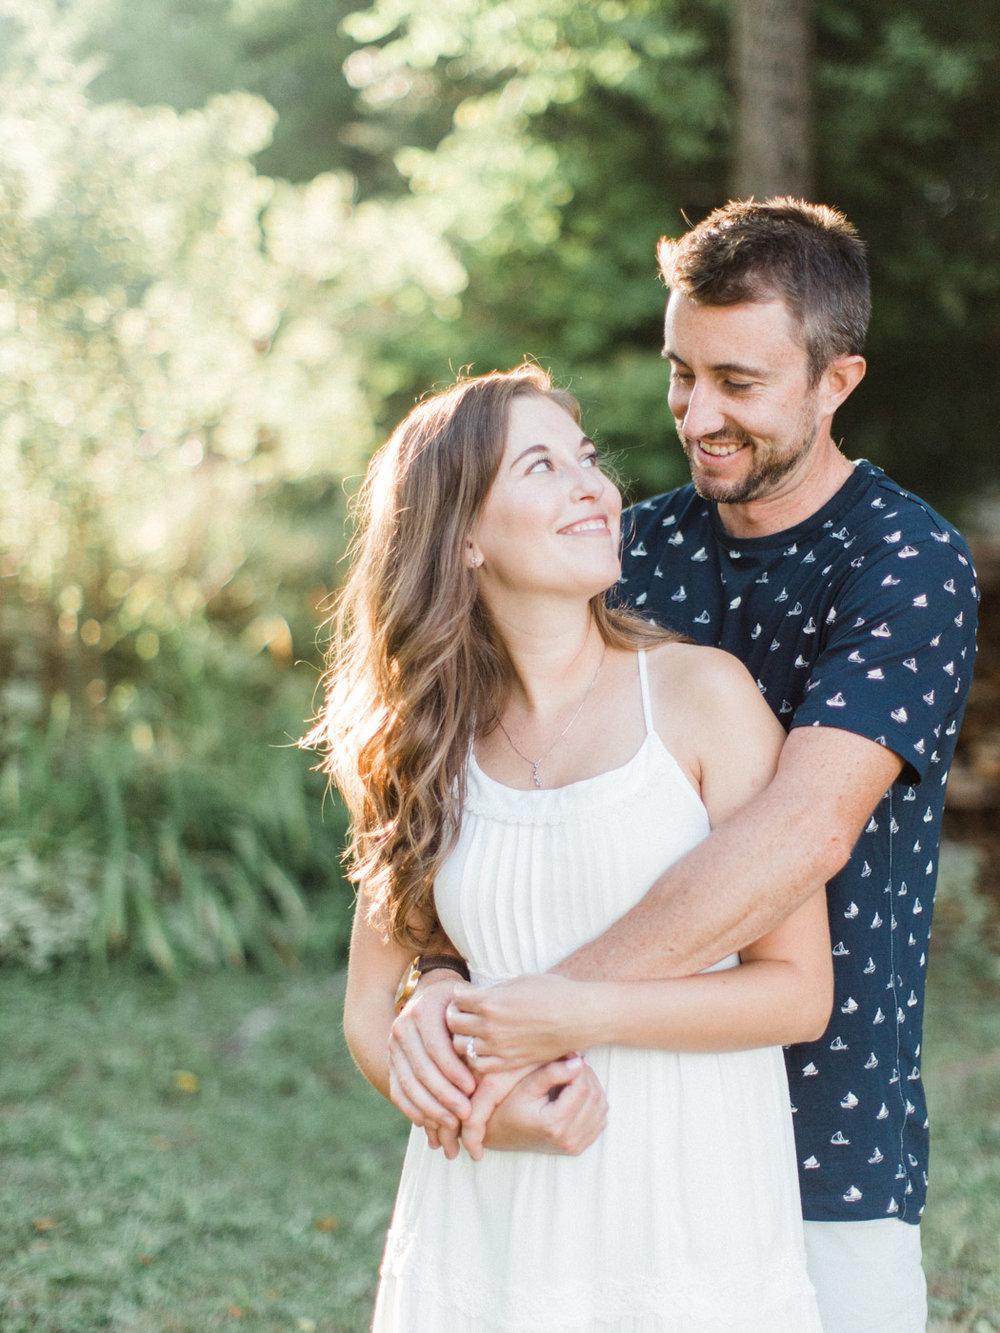 muskoka-wedding-photographer-adventurous-couples-engagement-session-lake-24.jpg